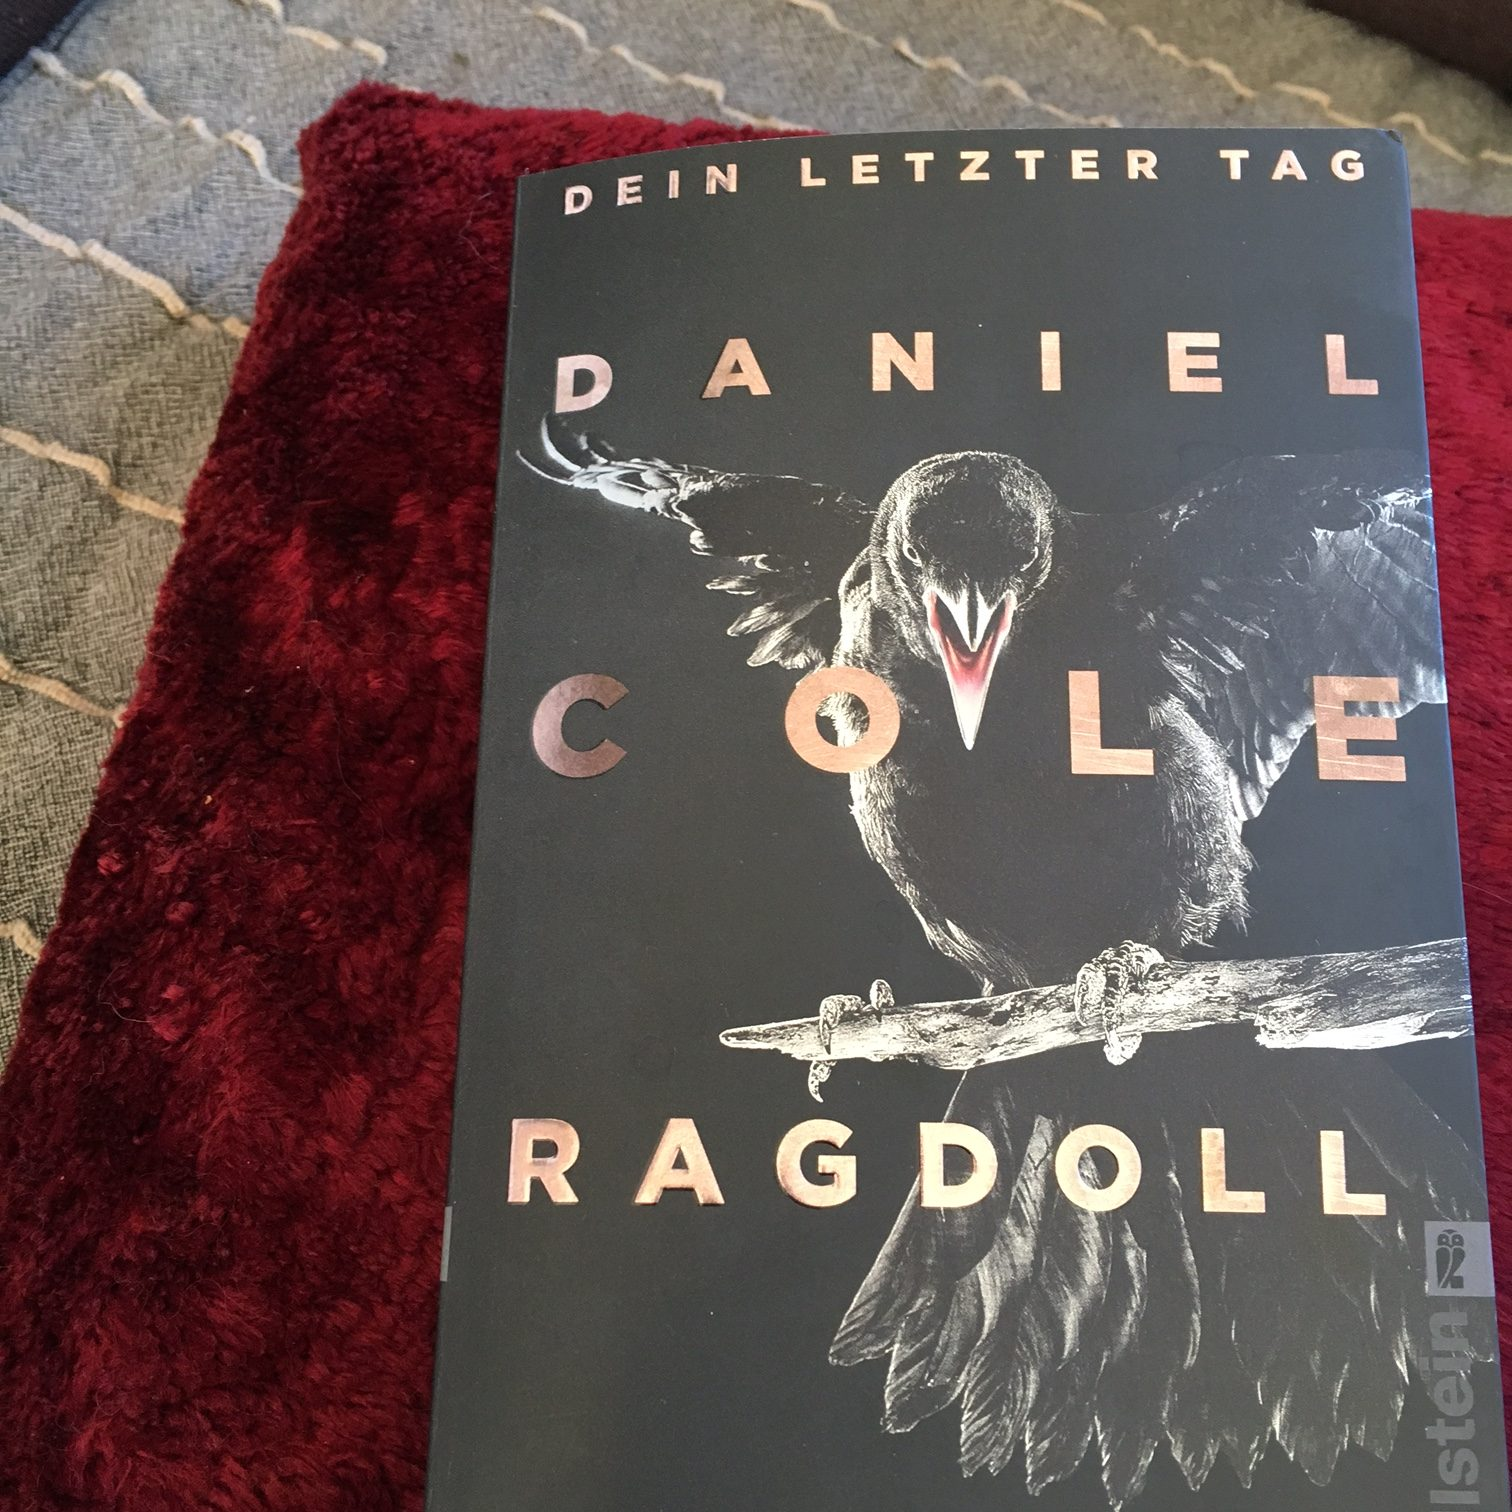 Daniel Cole Ragdoll. Dein letzter Tag Krimi